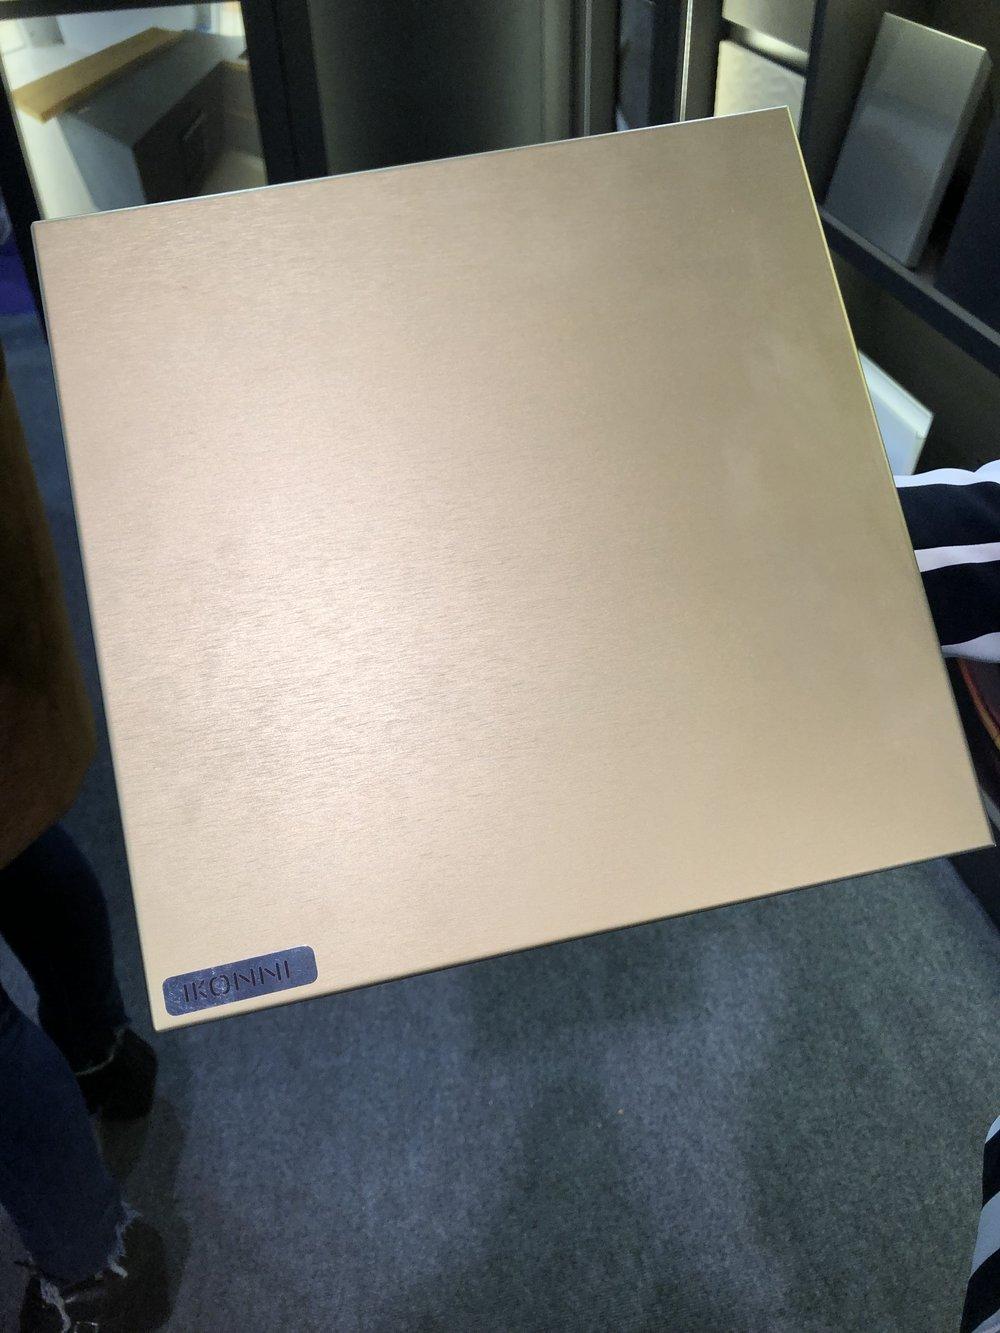 Brushed brass cabinet door | KBIS 2019 Surfaces Trends